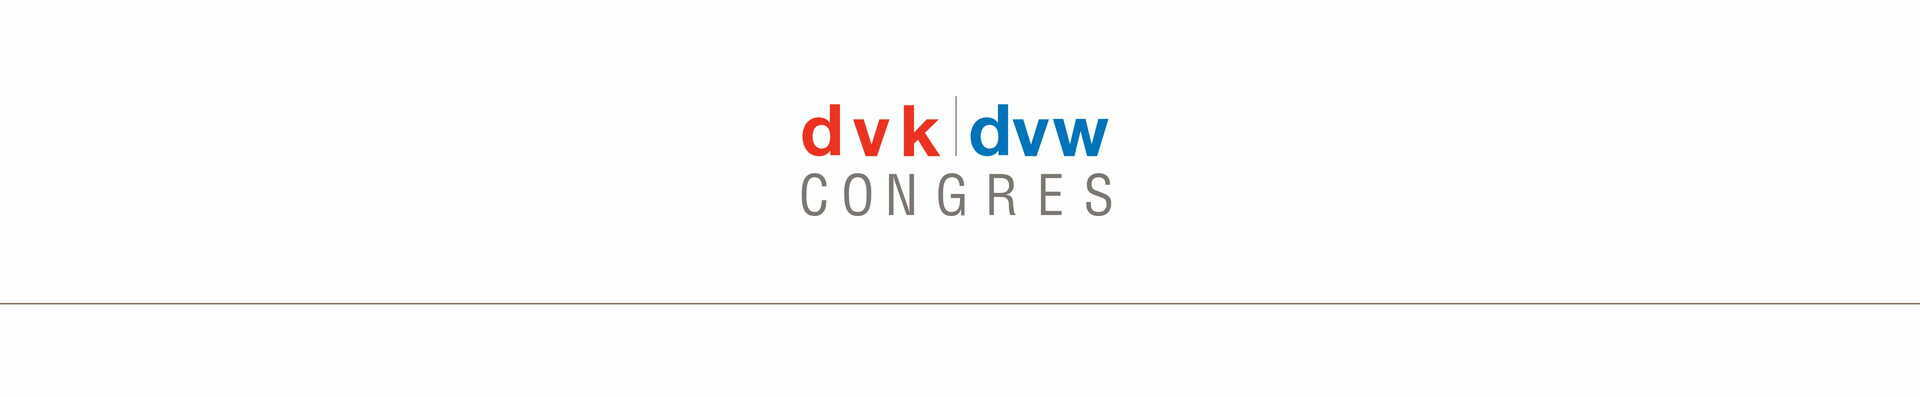 dvk | dvw congres